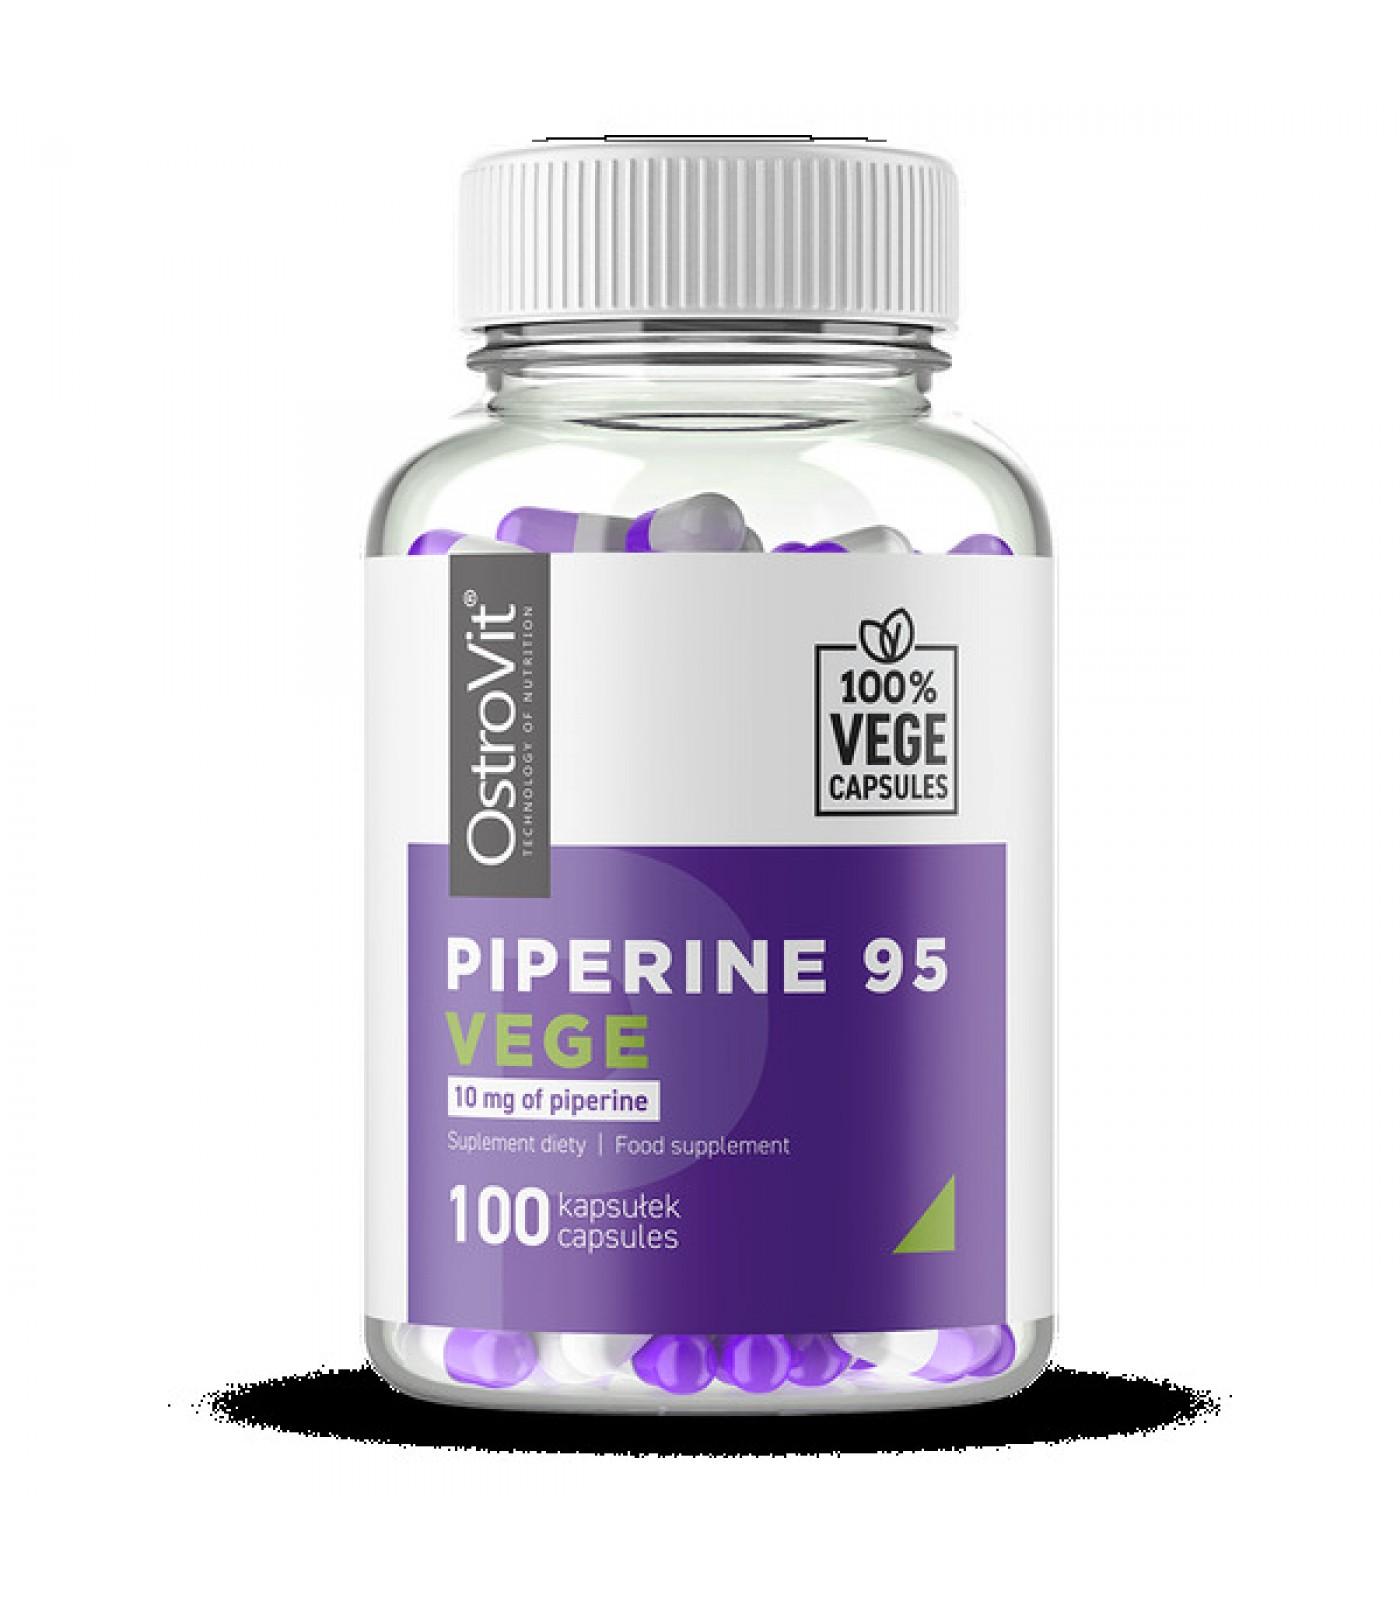 OstroVit - Piperine 95 / Vege / 100caps.